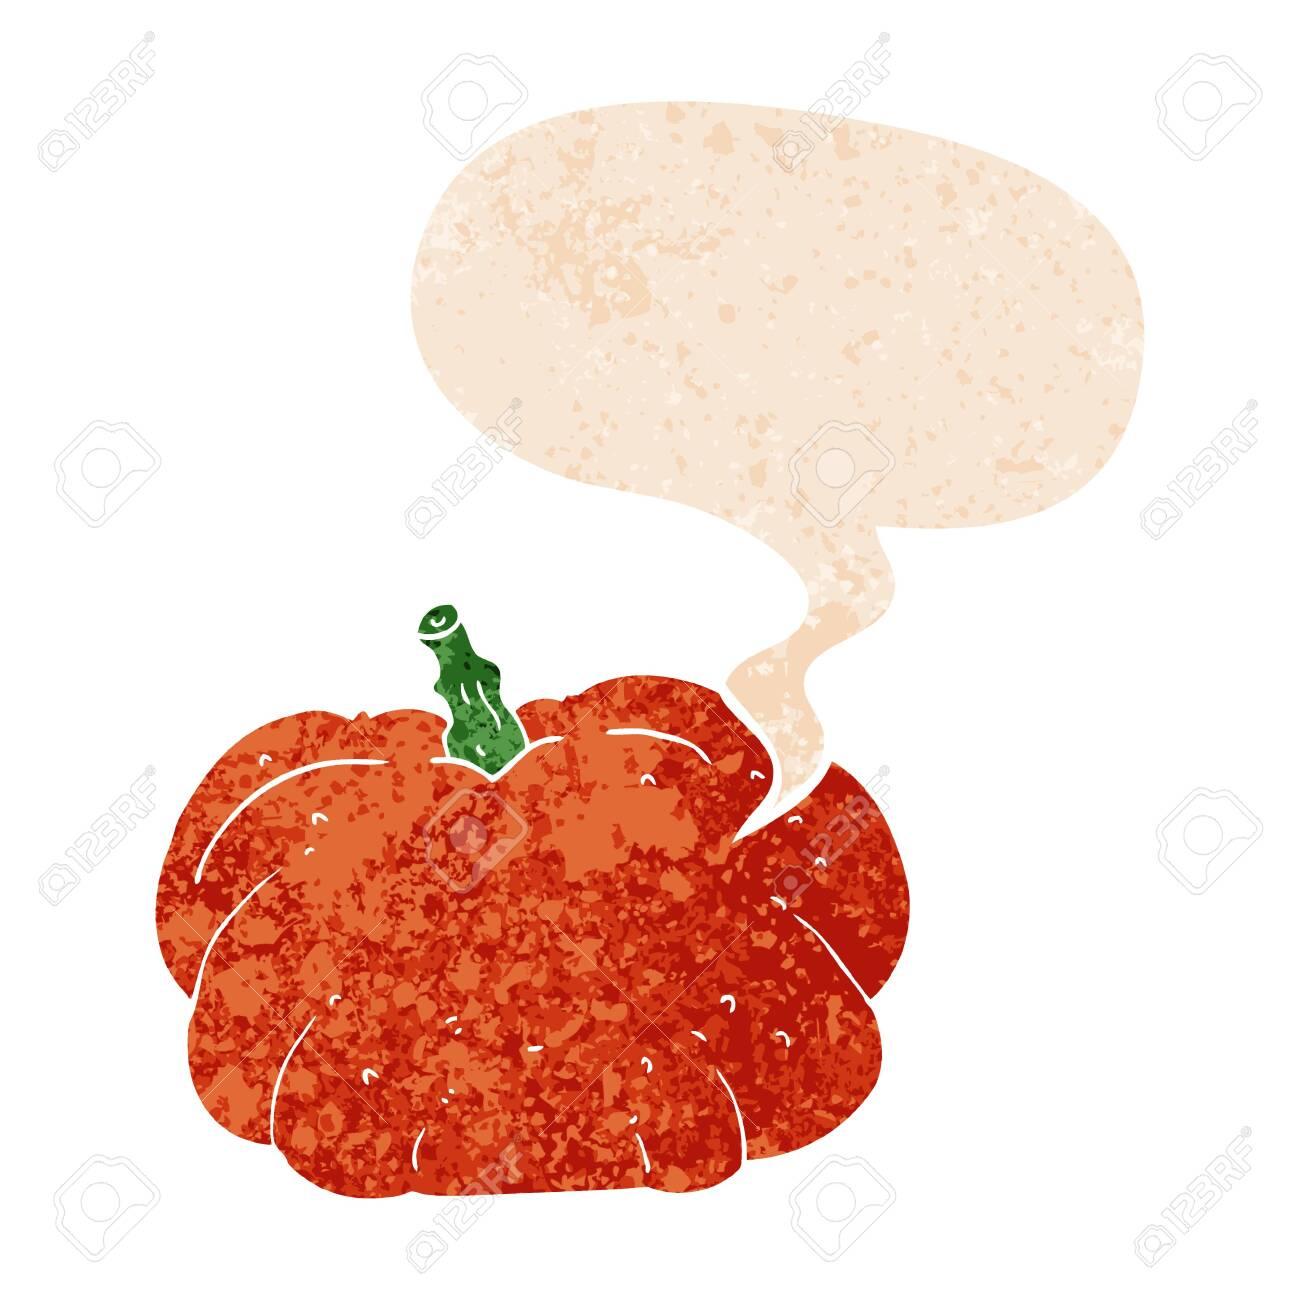 cartoon pumpkin with speech bubble in grunge distressed retro textured style - 130300325